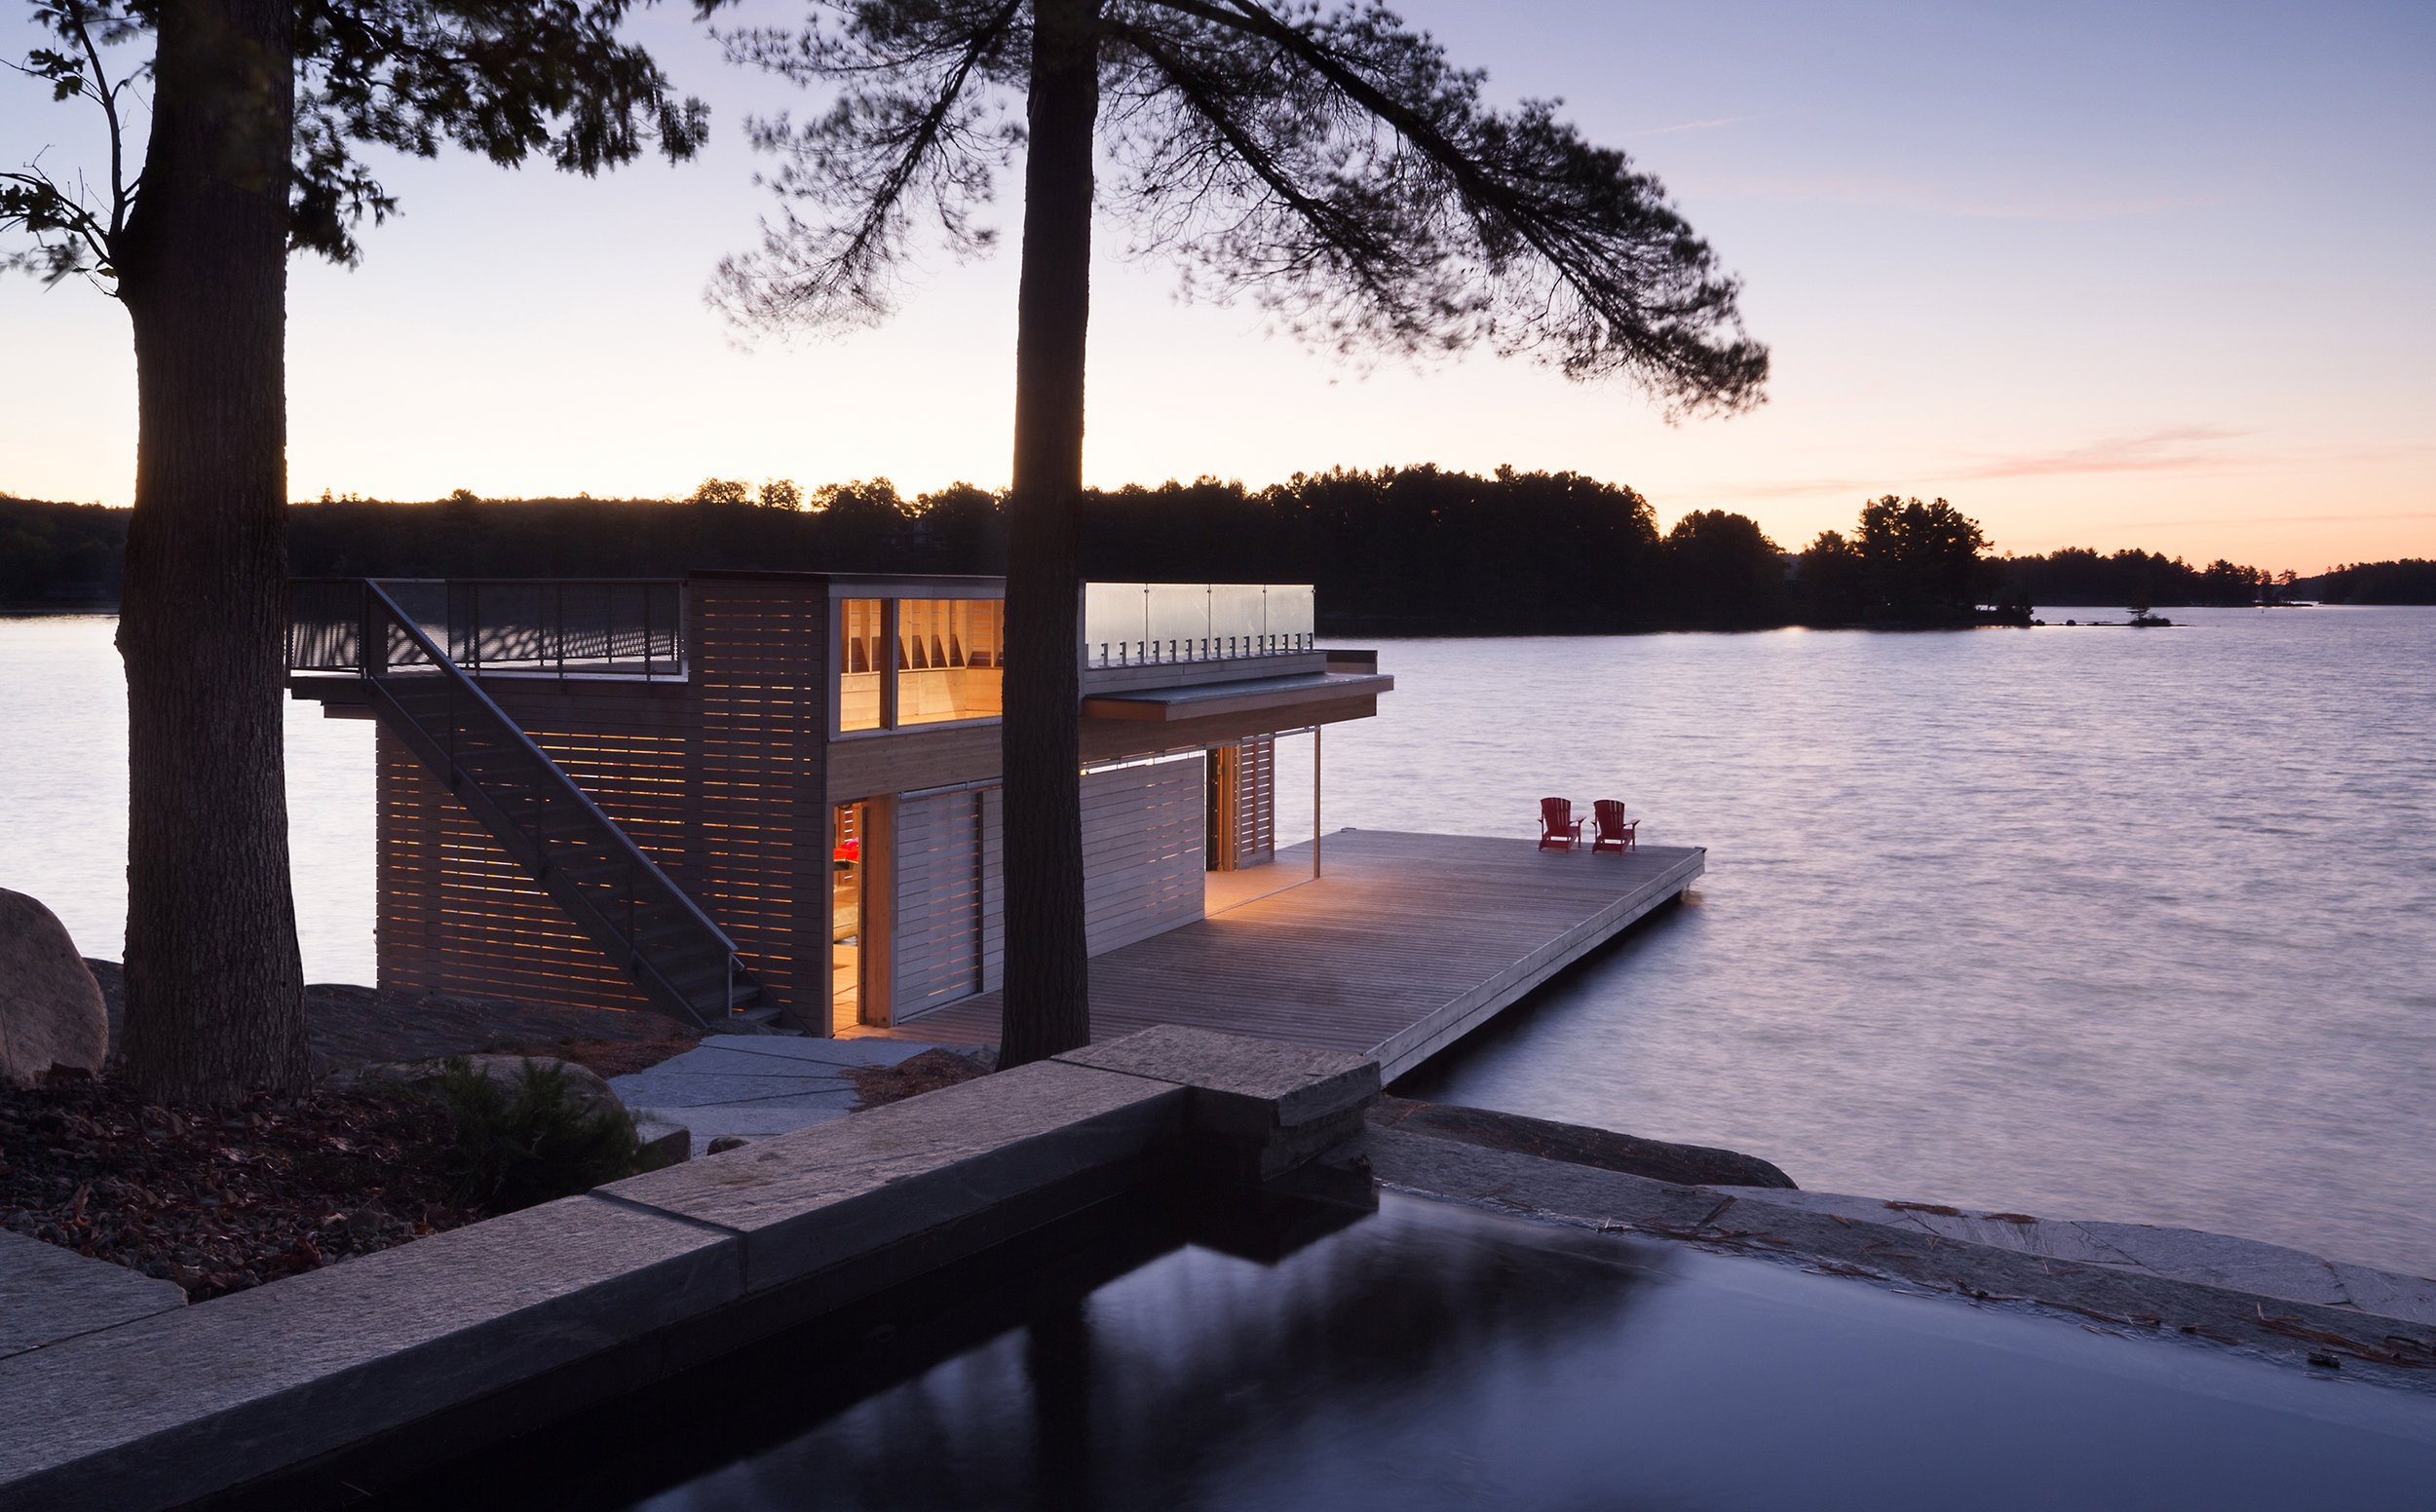 turkel_design_modern_prefab_home_muskoka_boathouse_night.jpg